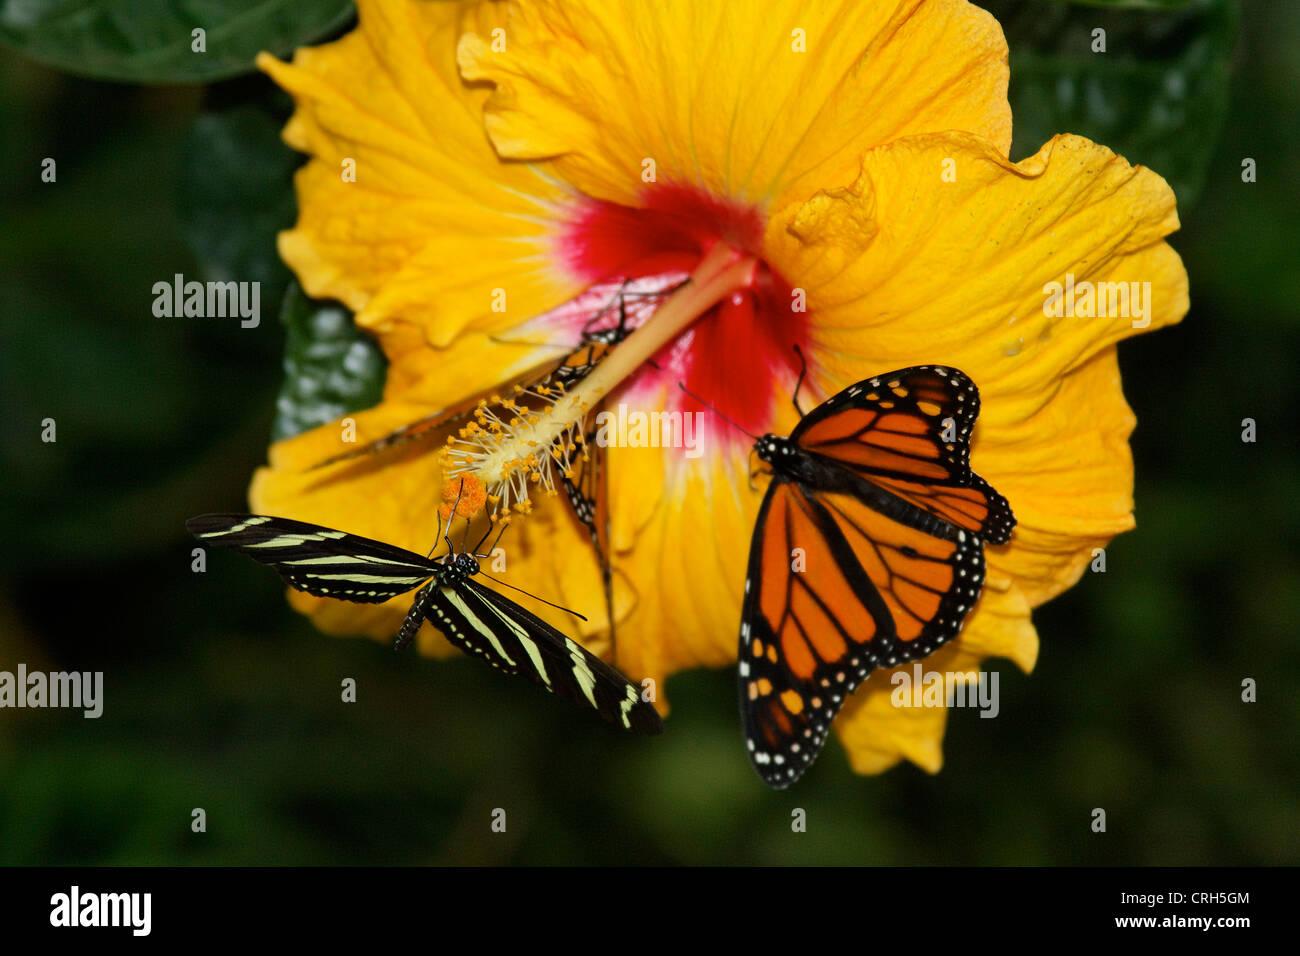 Schmetterlinge in der Natur - butterfly in nature Monarchfalter - Danaus plexippus bedrohte Tierart - Protected - Stock Image